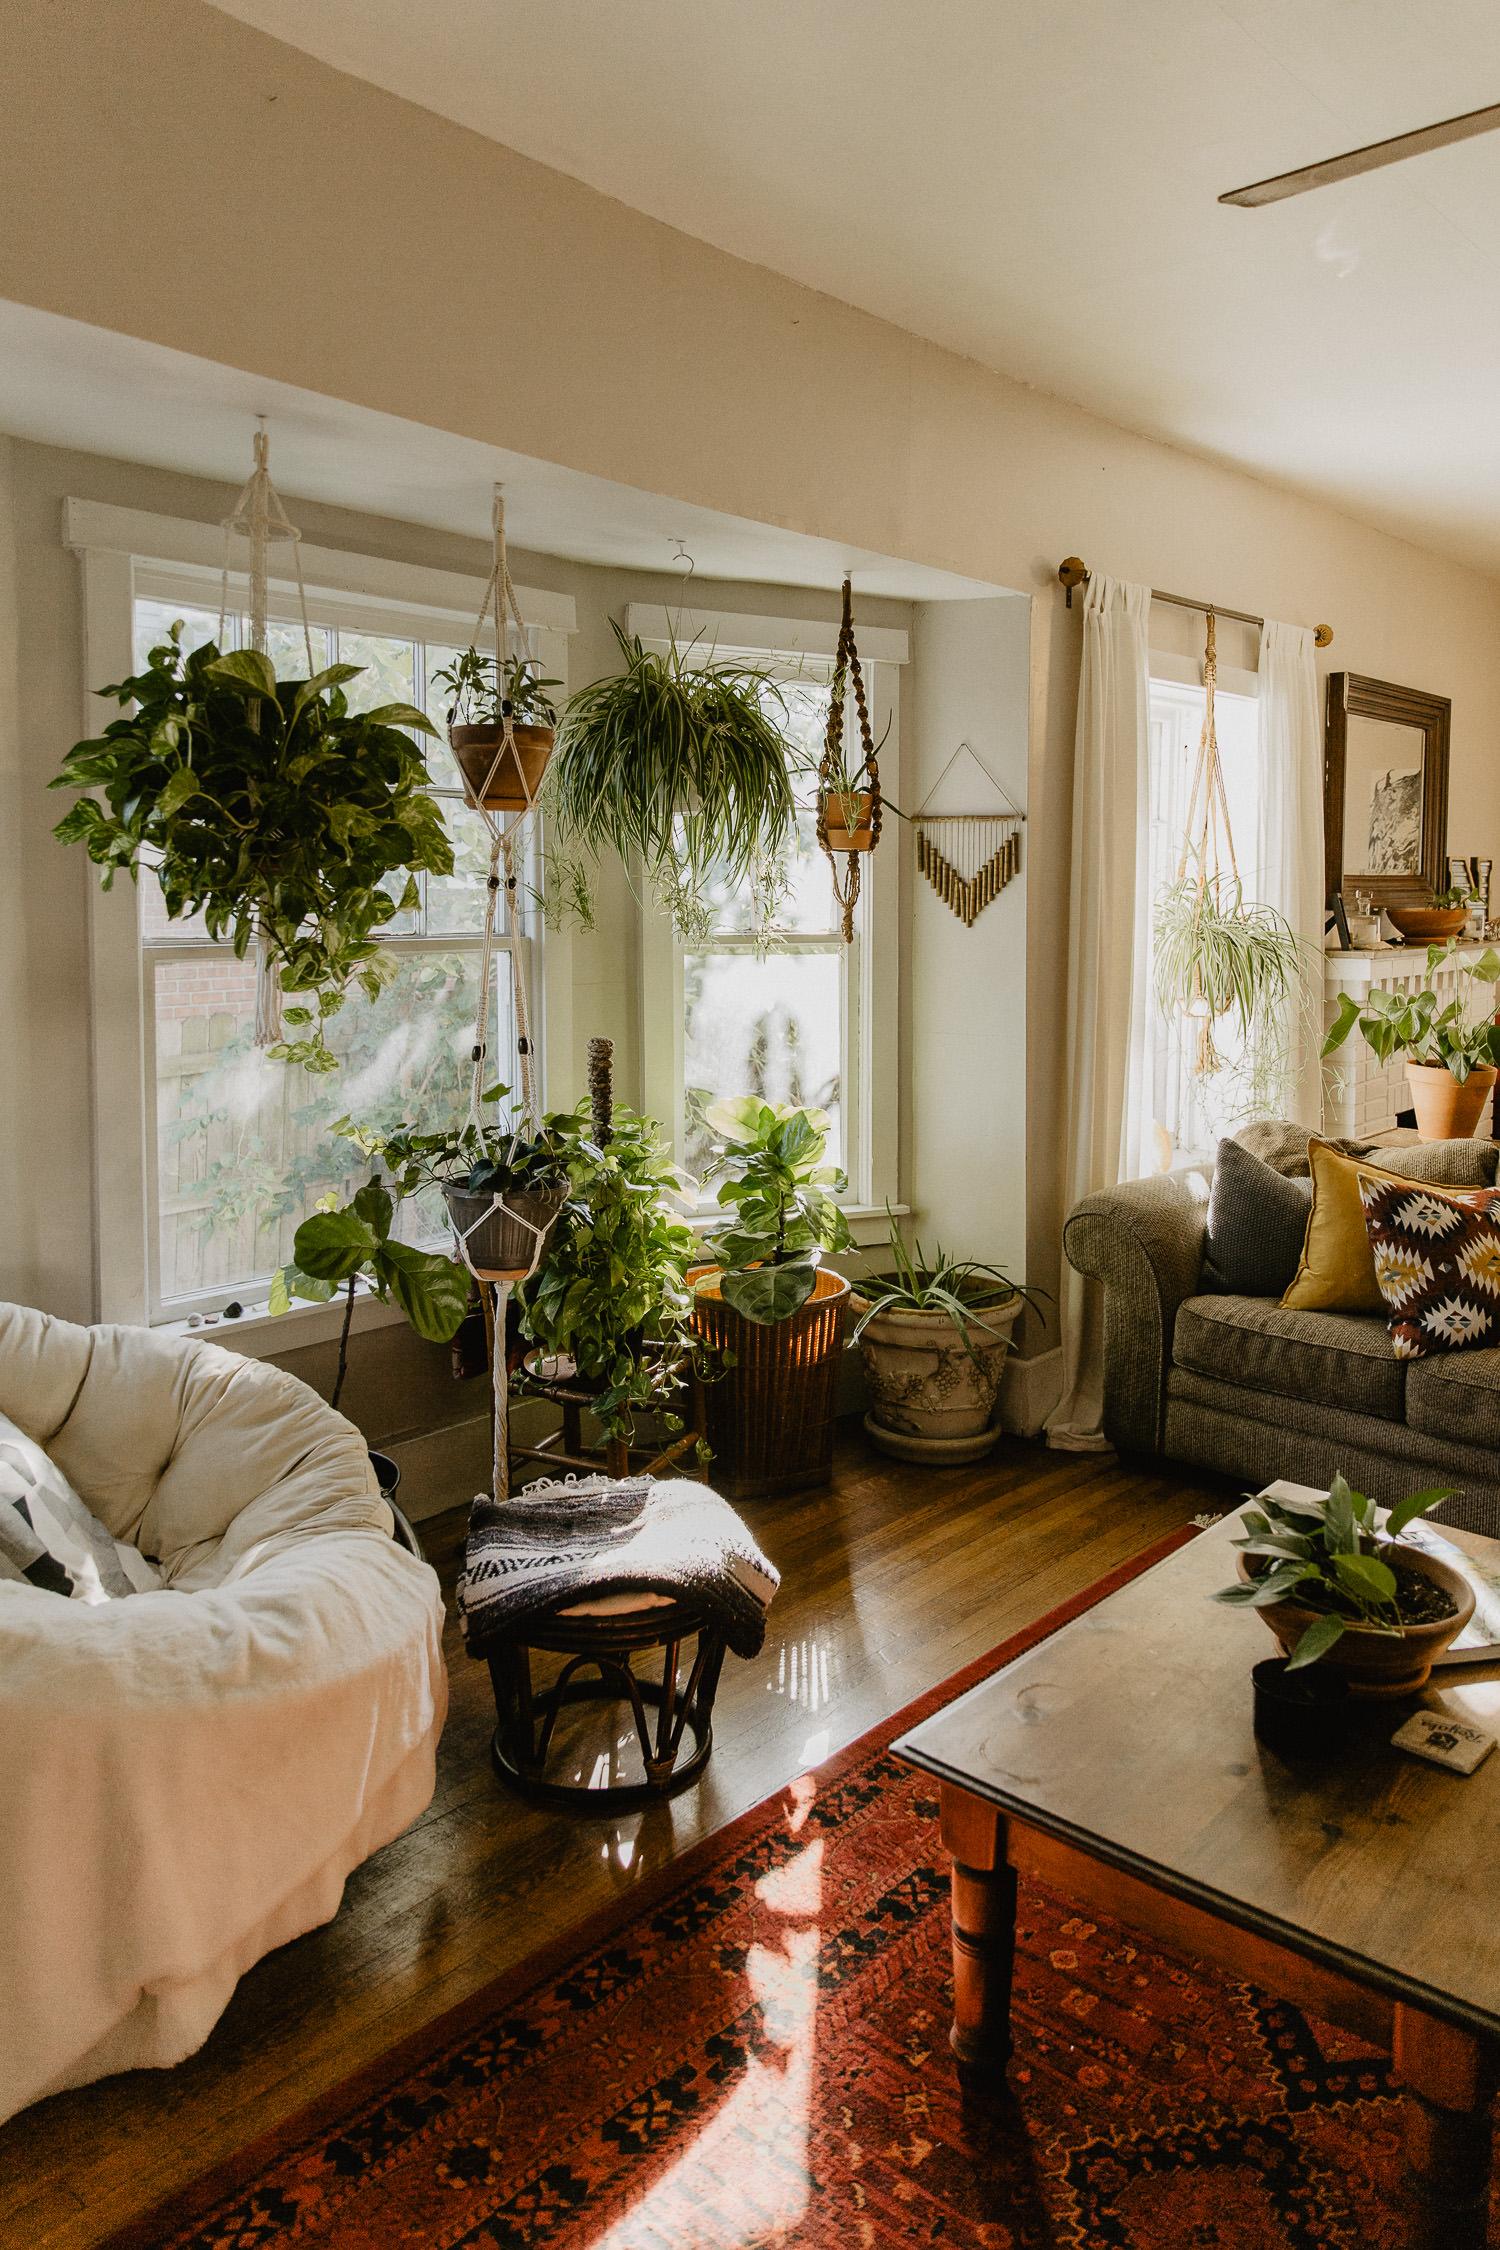 Plant_Filled_In_Home_Session-Ivory_&_Oak-1.jpg